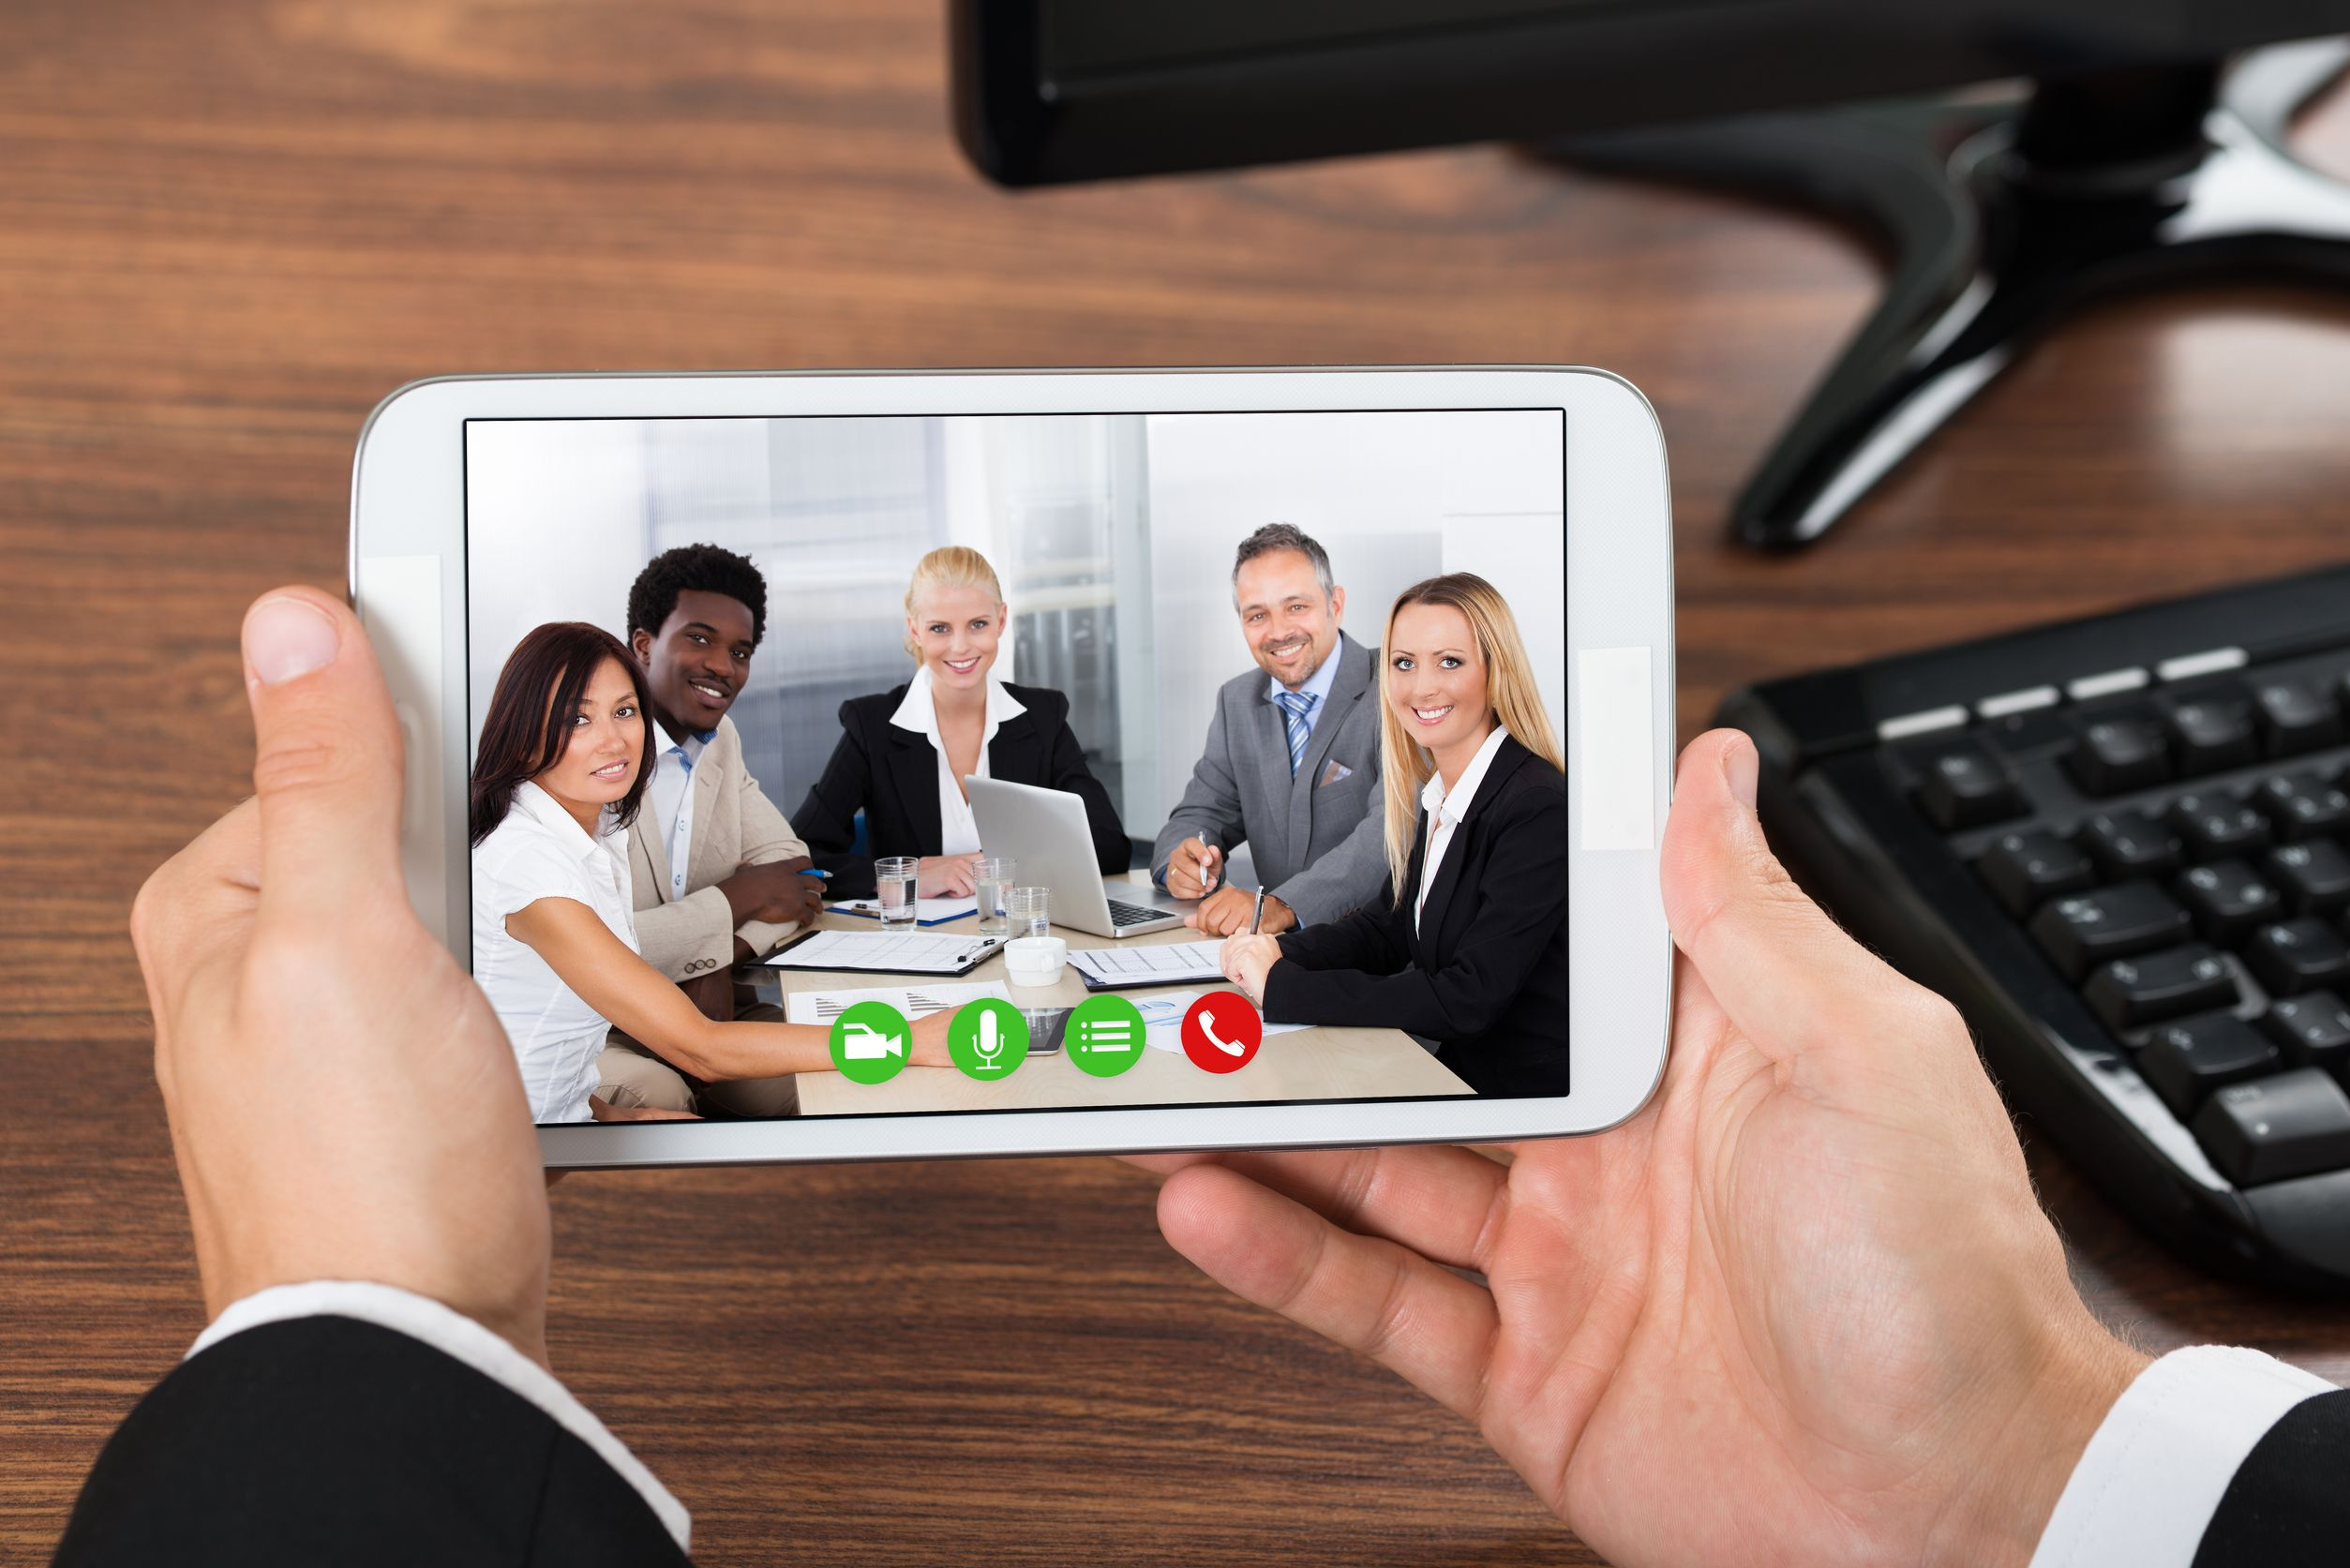 mobile video storage market research